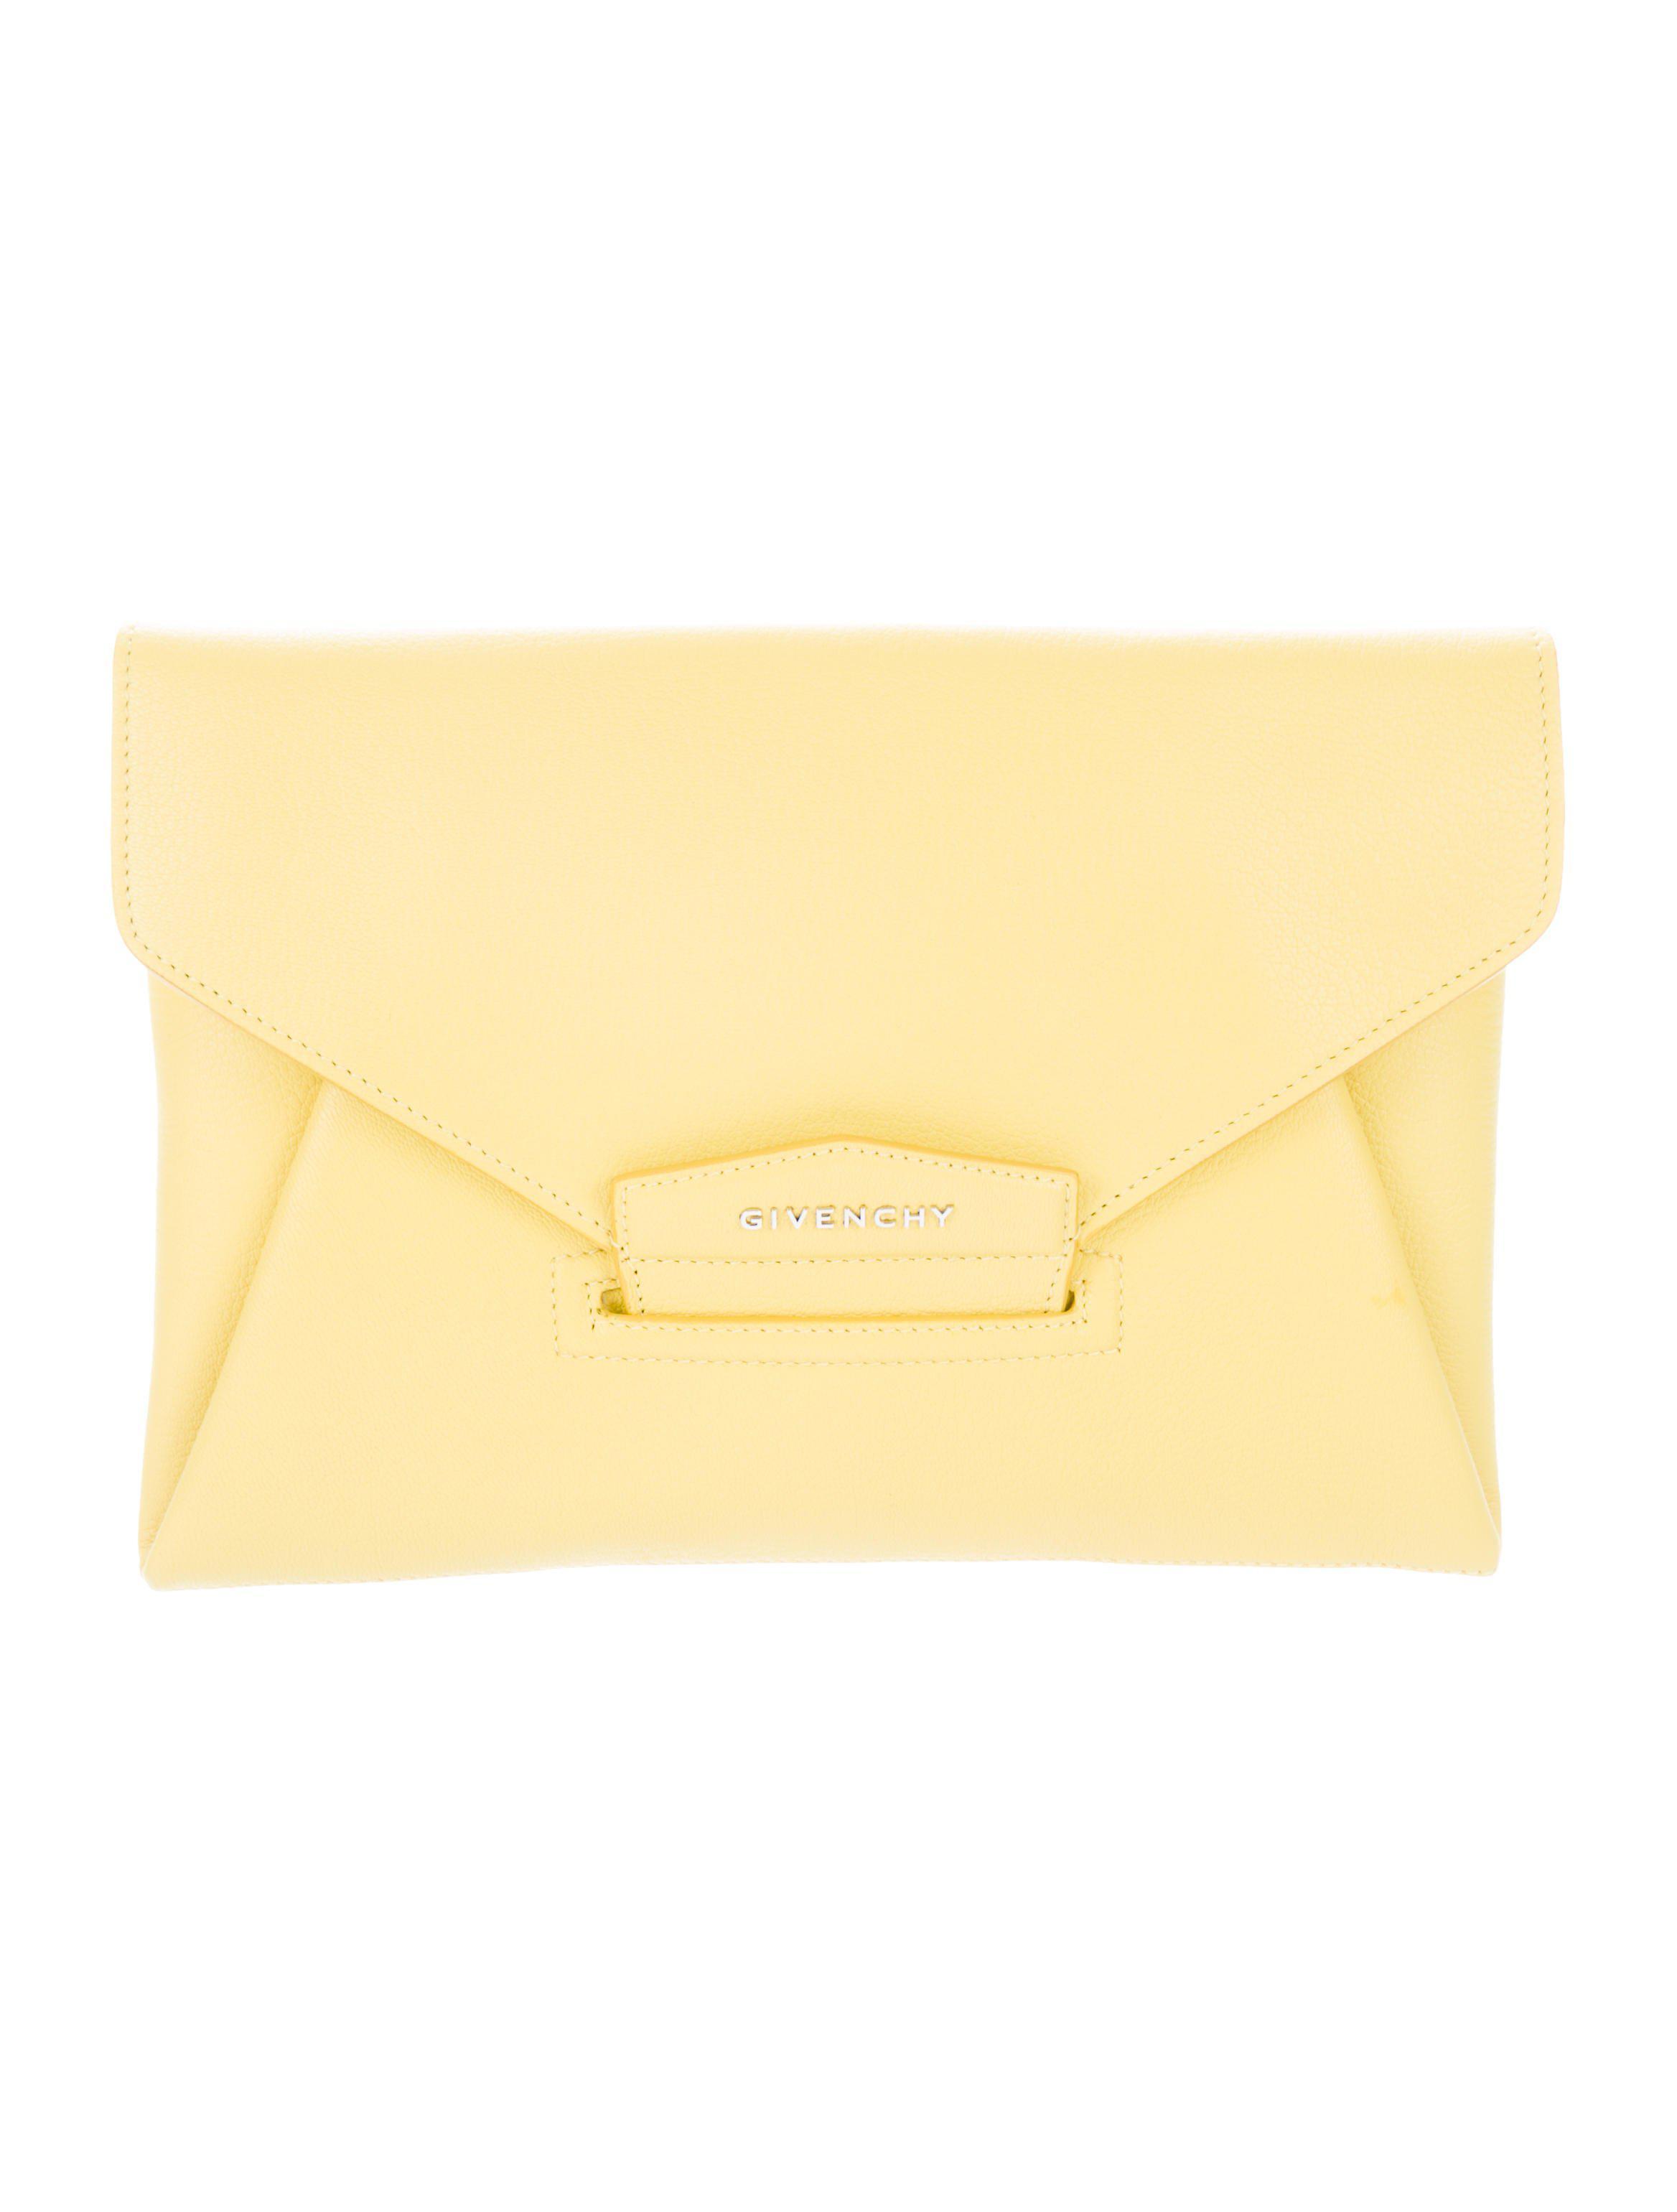 1266236c23 Lyst - Givenchy Antigona Leather Clutch W  Tags Yellow in Metallic